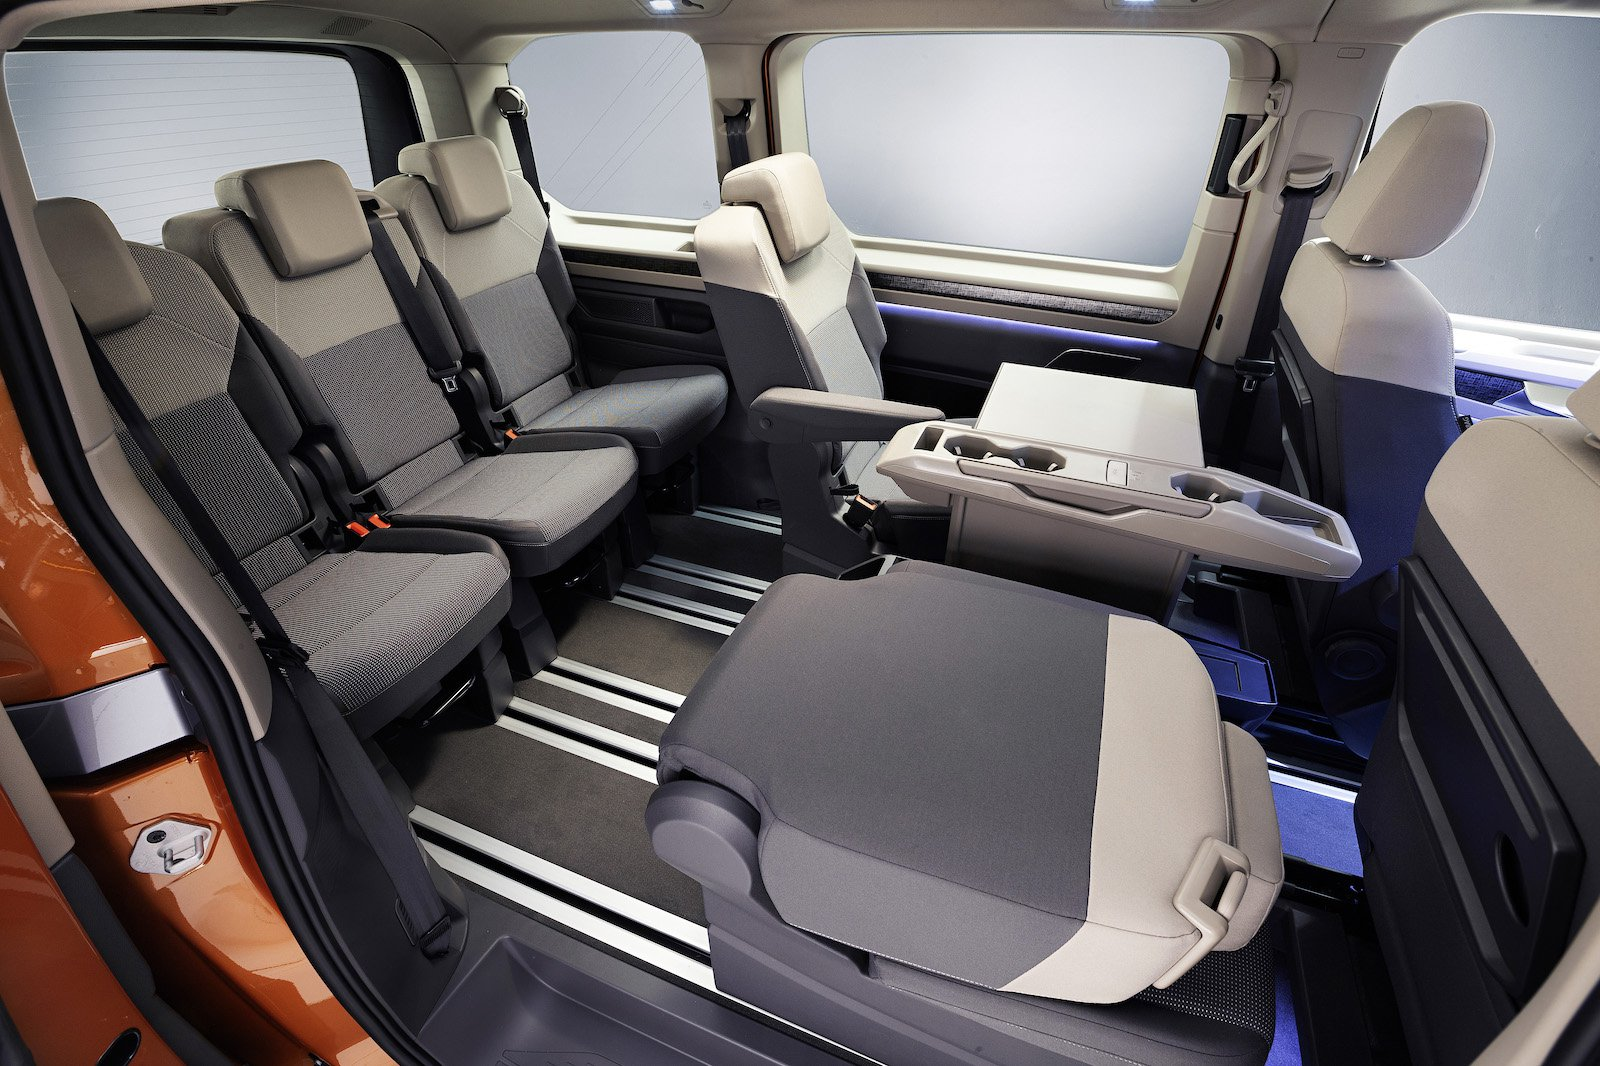 VW Multivan seats interior